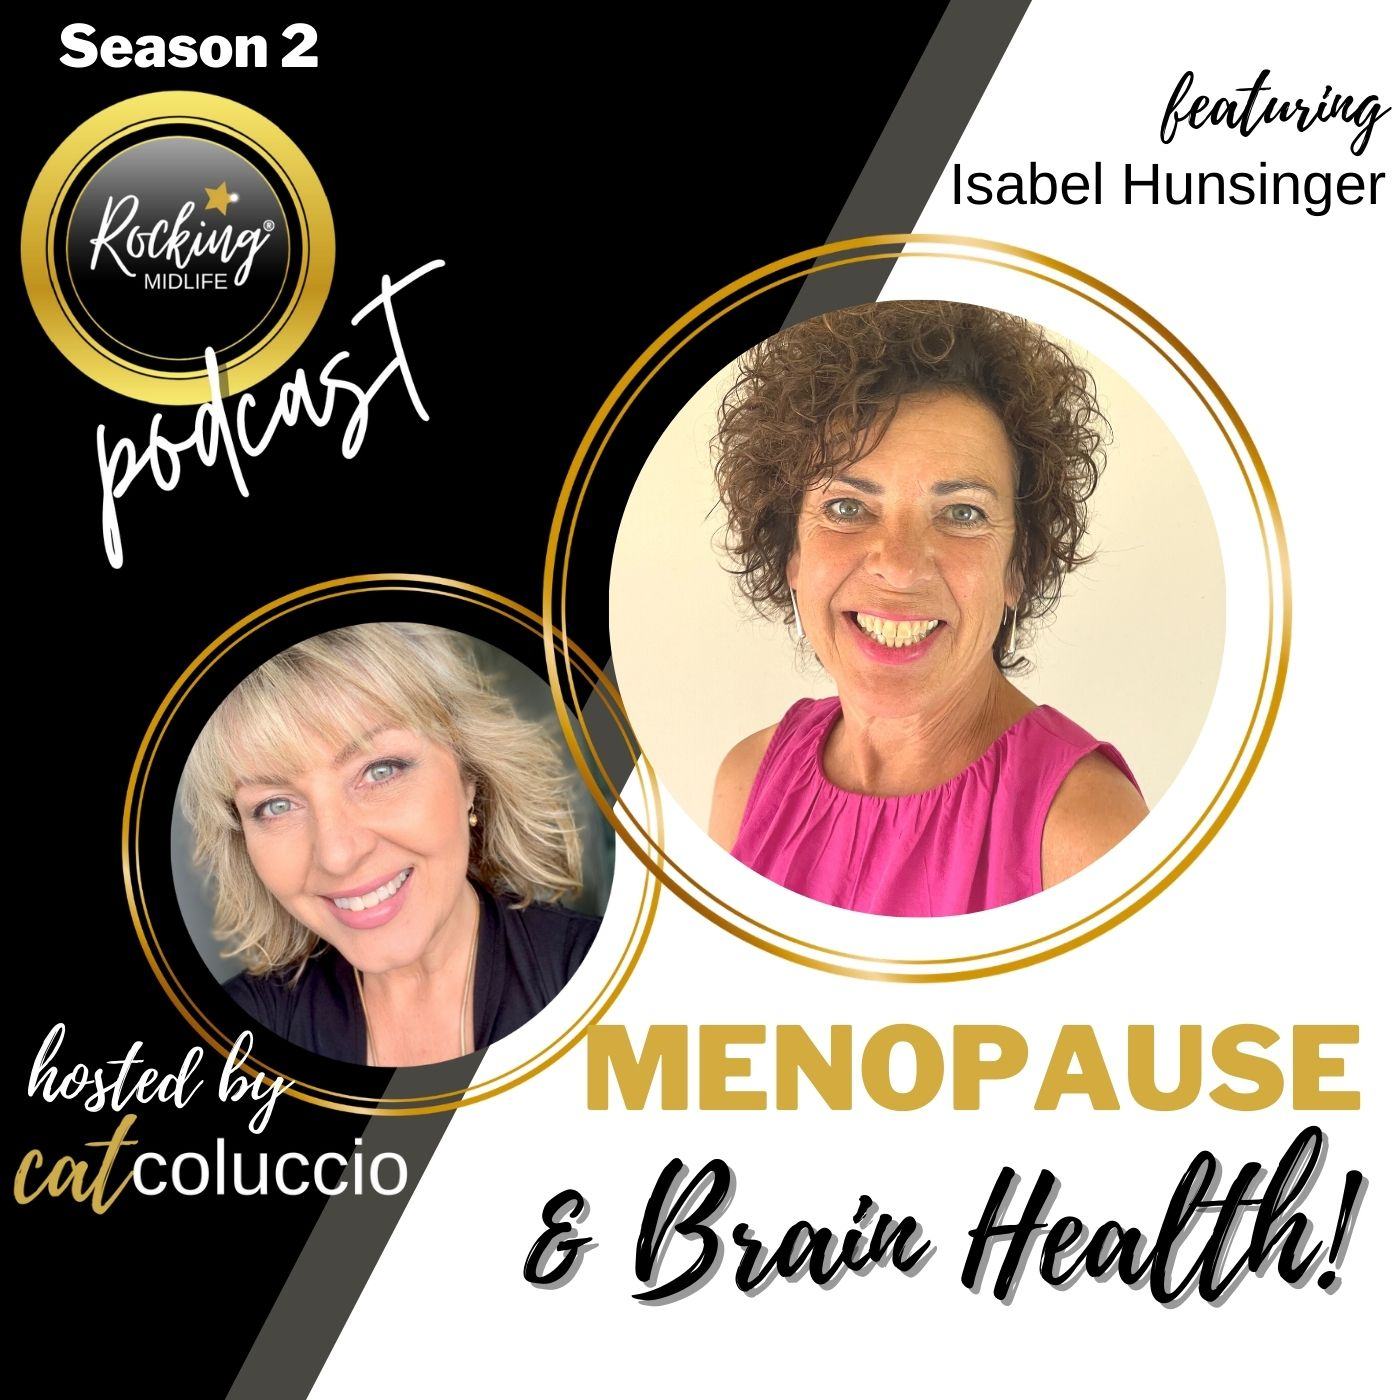 Menopause & brain health (1)